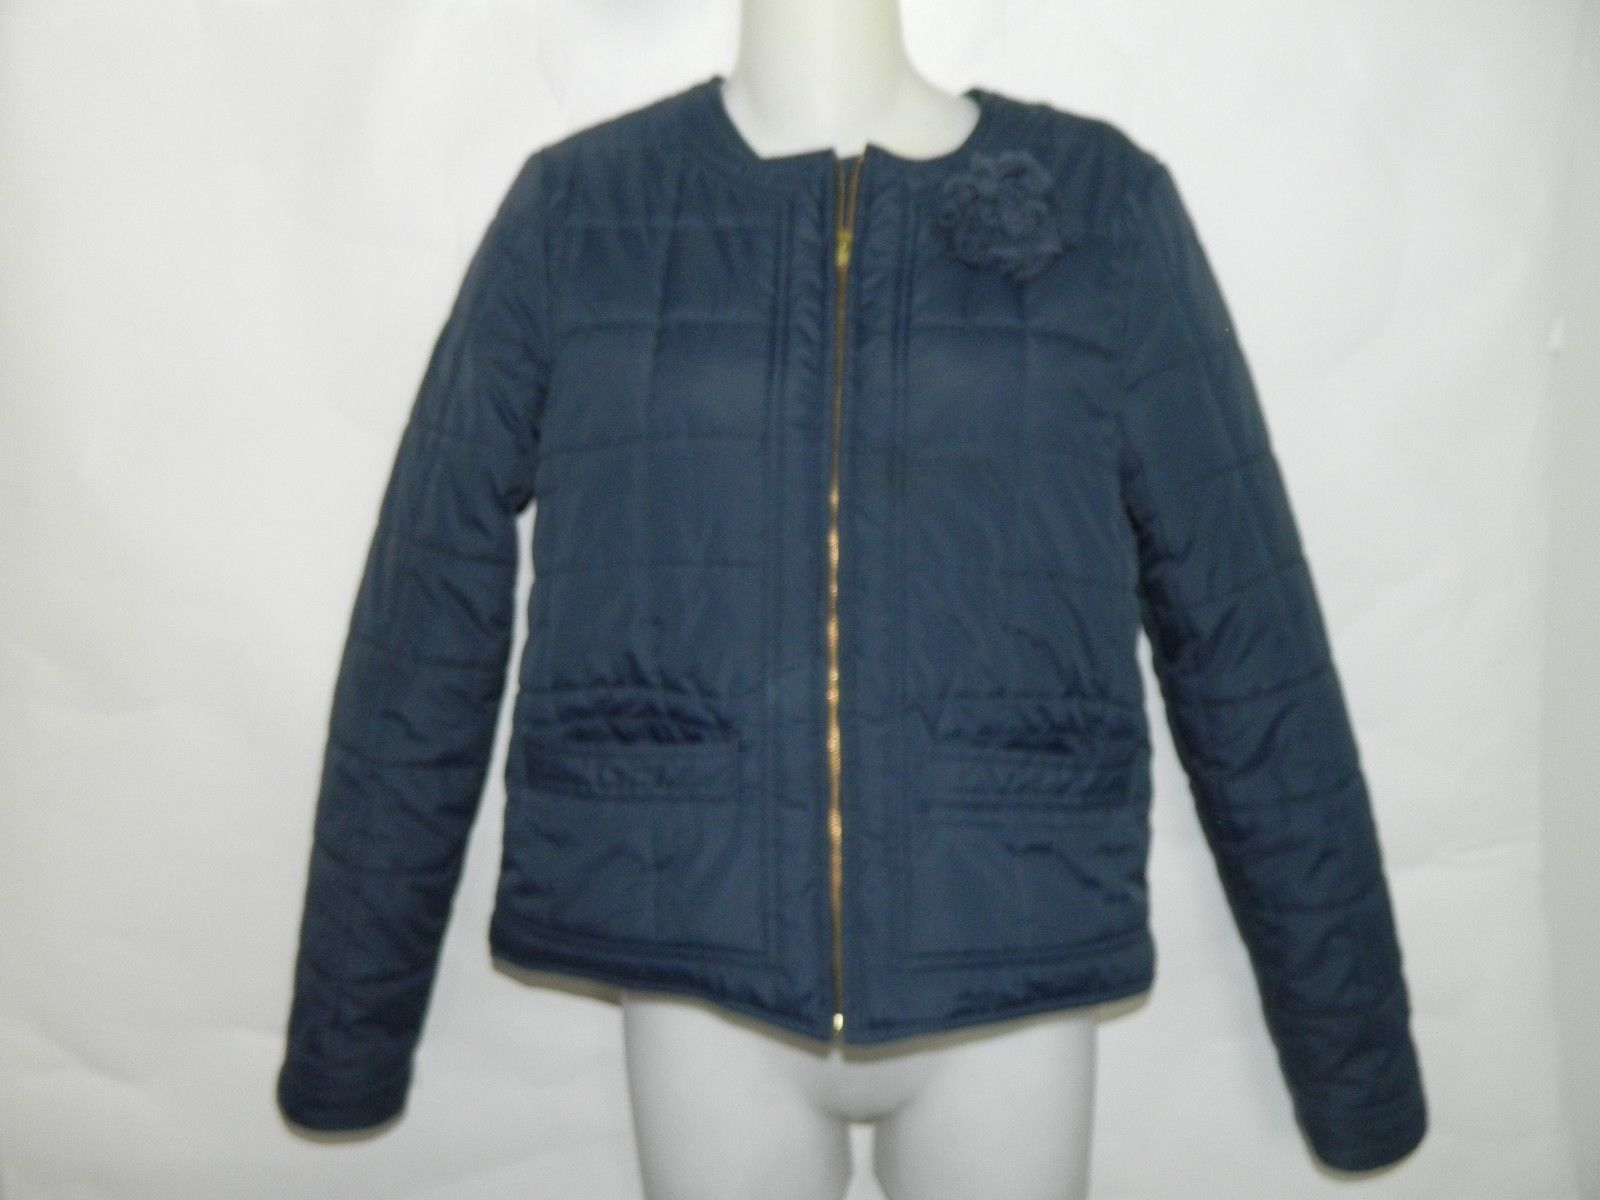 9225c5989092e J Crew Crewcuts Jacket Navy Girls Coat and 50 similar items. 57